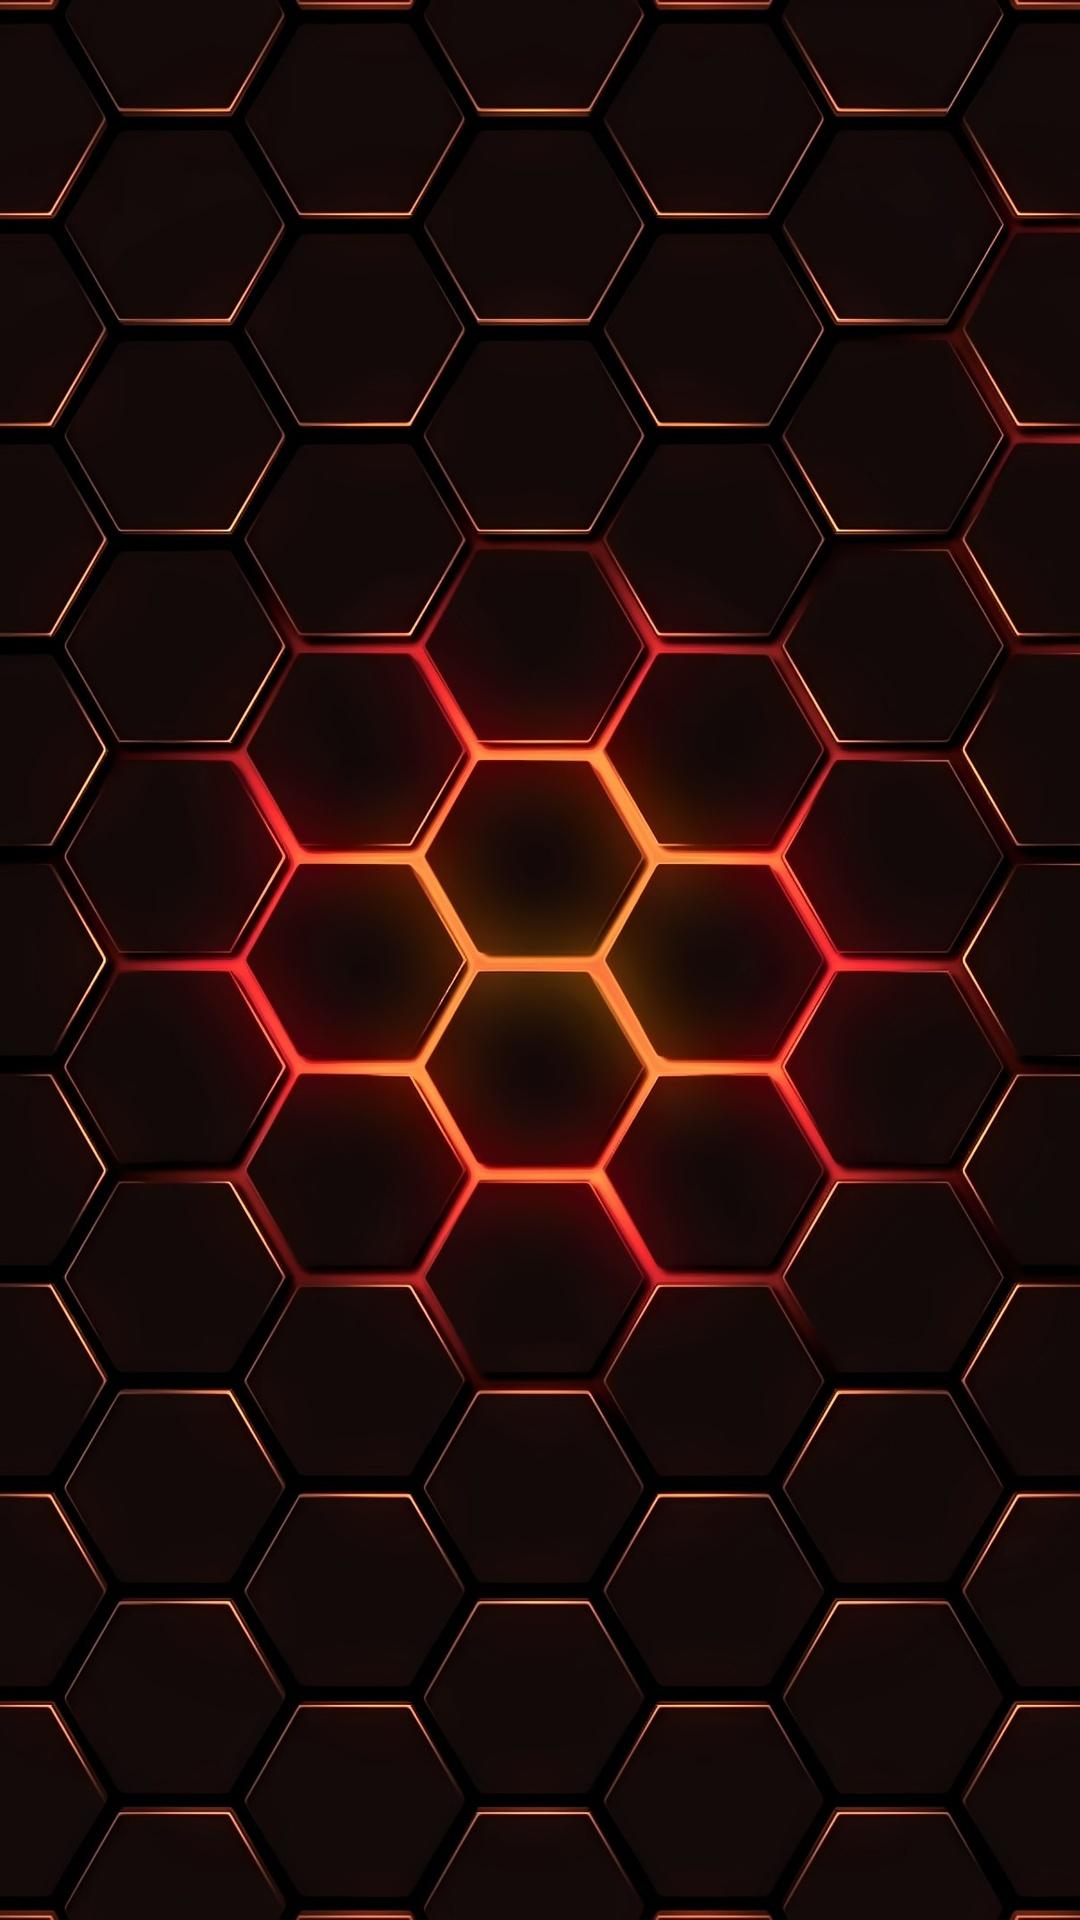 1080x1920 Hexagon Geometry 4k Iphone 7 6s 6 Plus Pixel xl e Plus